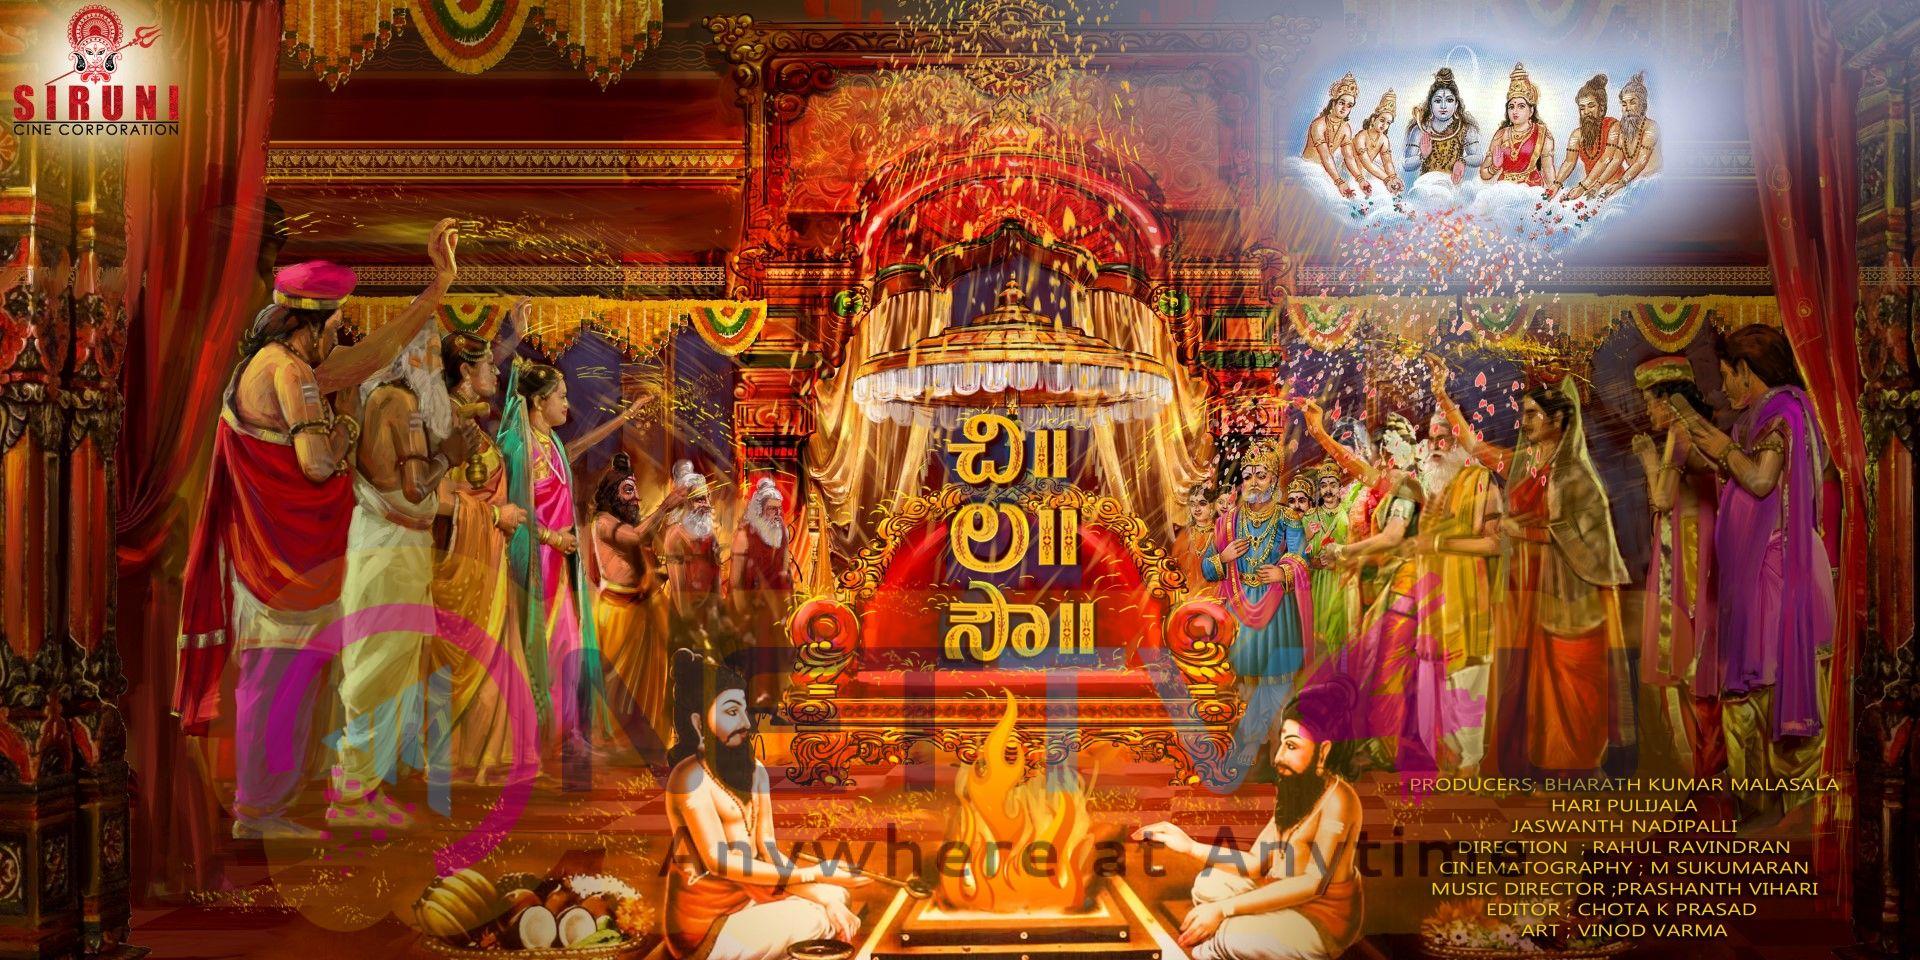 Chi La Sow Telugu Movie Title Poster Telugu Gallery